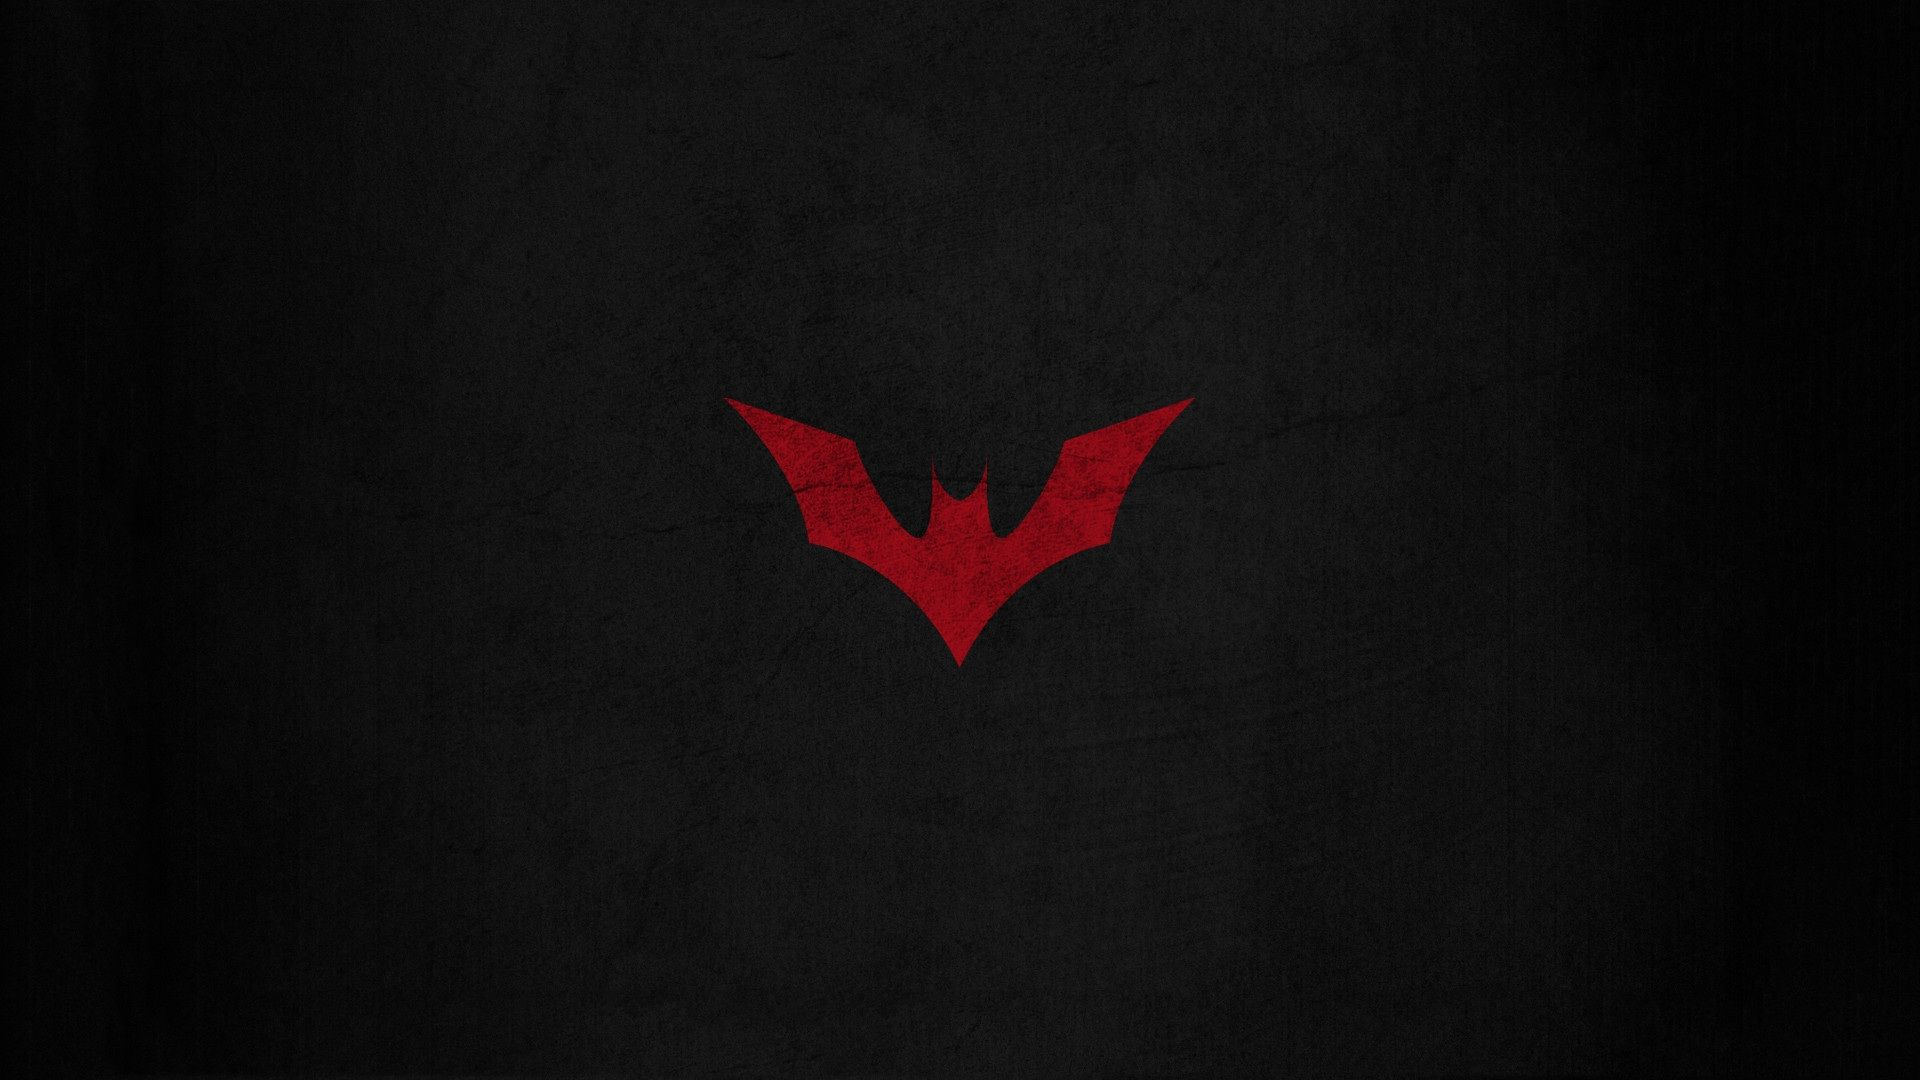 Batman HD Wallpapers Backgrounds Wallpaper × Batman Hd